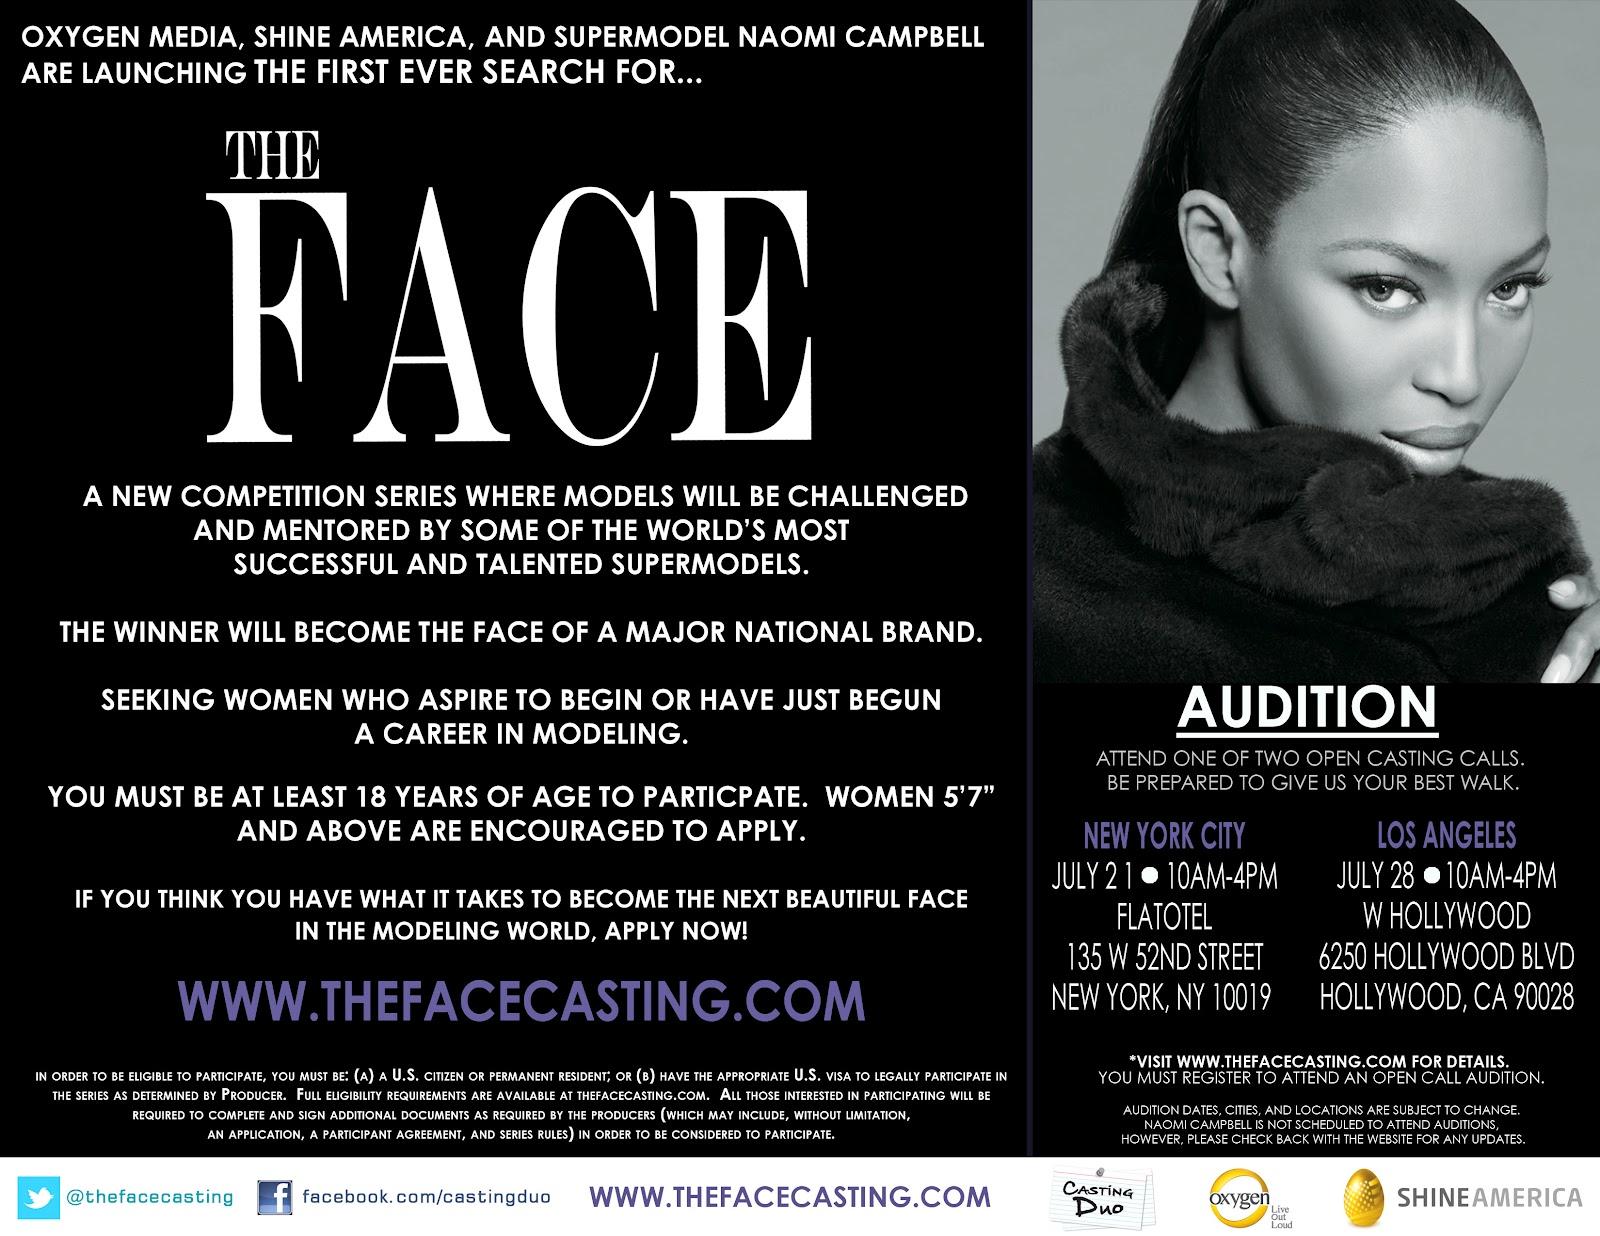 http://4.bp.blogspot.com/-TXajGb4--cY/UADjrQhgtwI/AAAAAAAAITs/exa0QhavzgE/s1600/The+Face+Casting+Flyer+%282%29.jpg